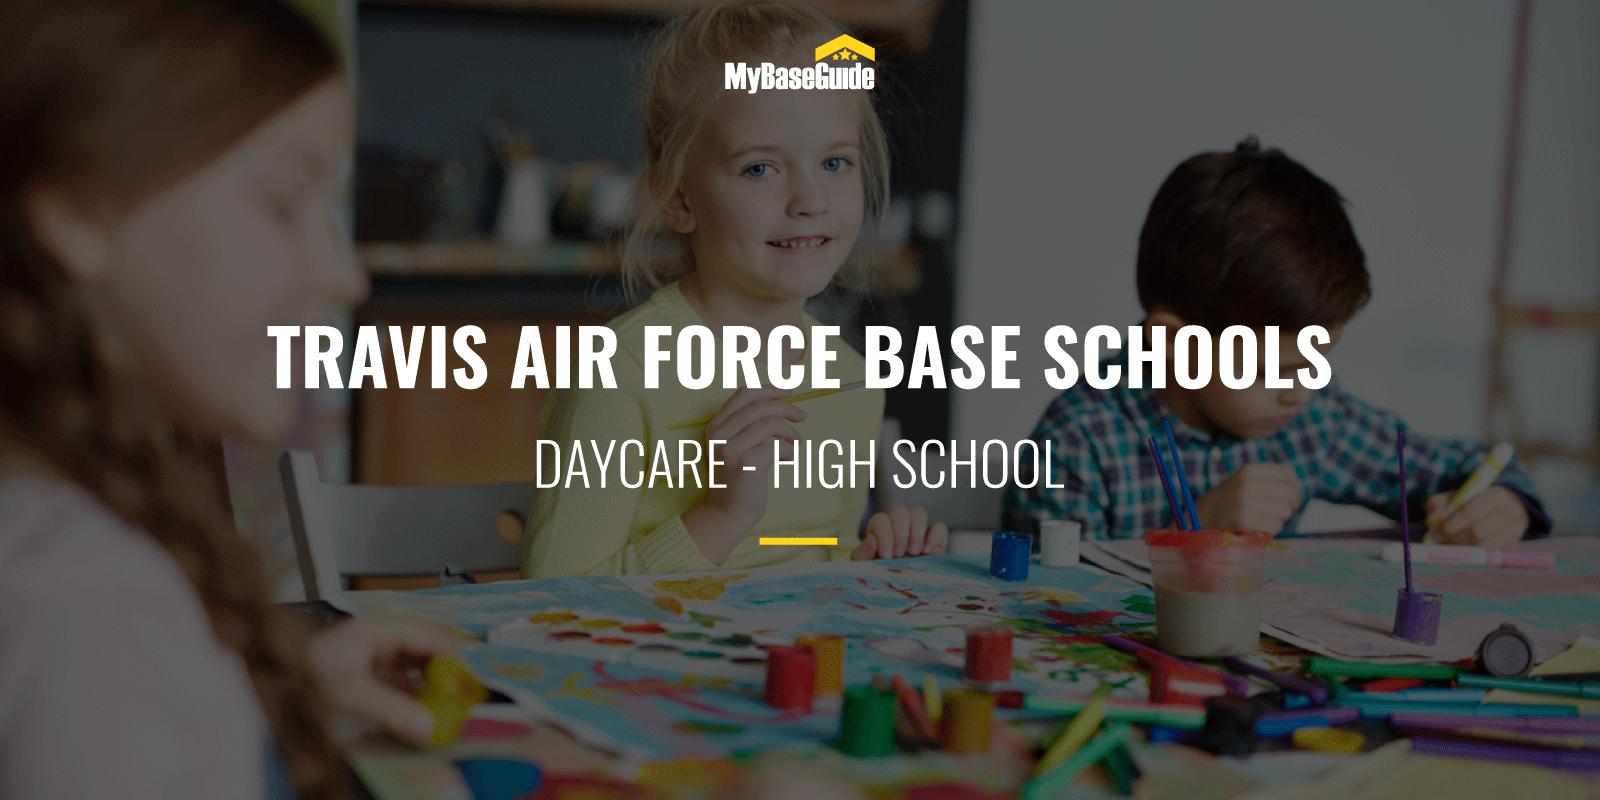 Travis Air Force Base Schools: Daycare - High School